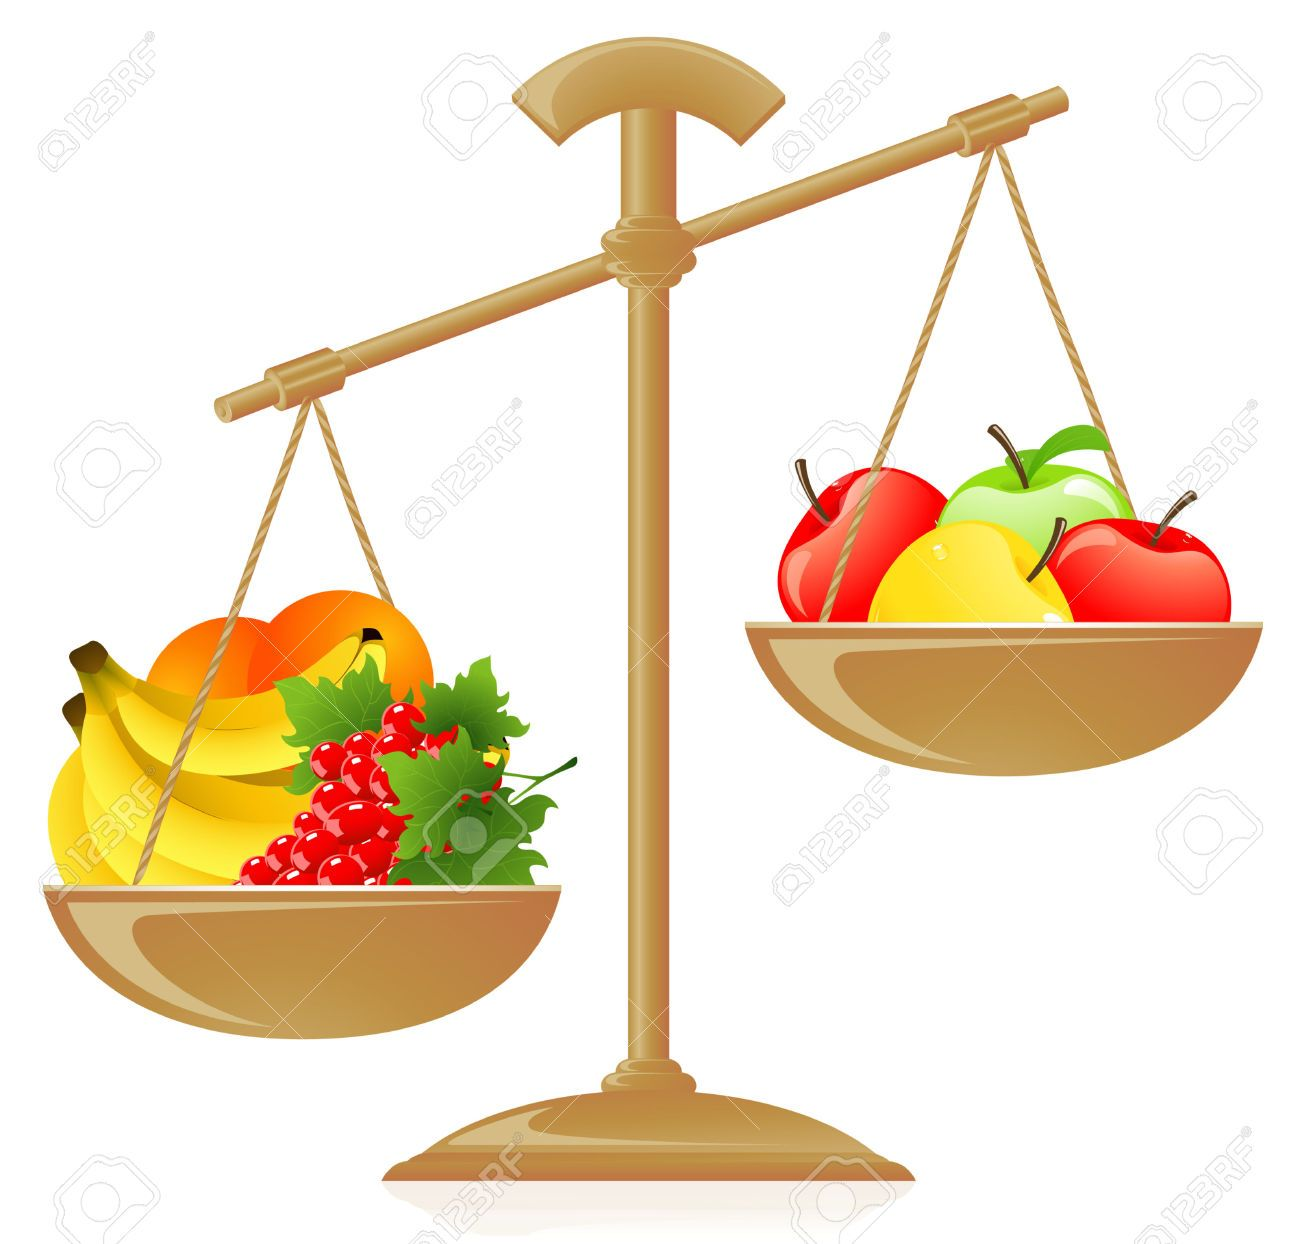 Balance Scale Weights